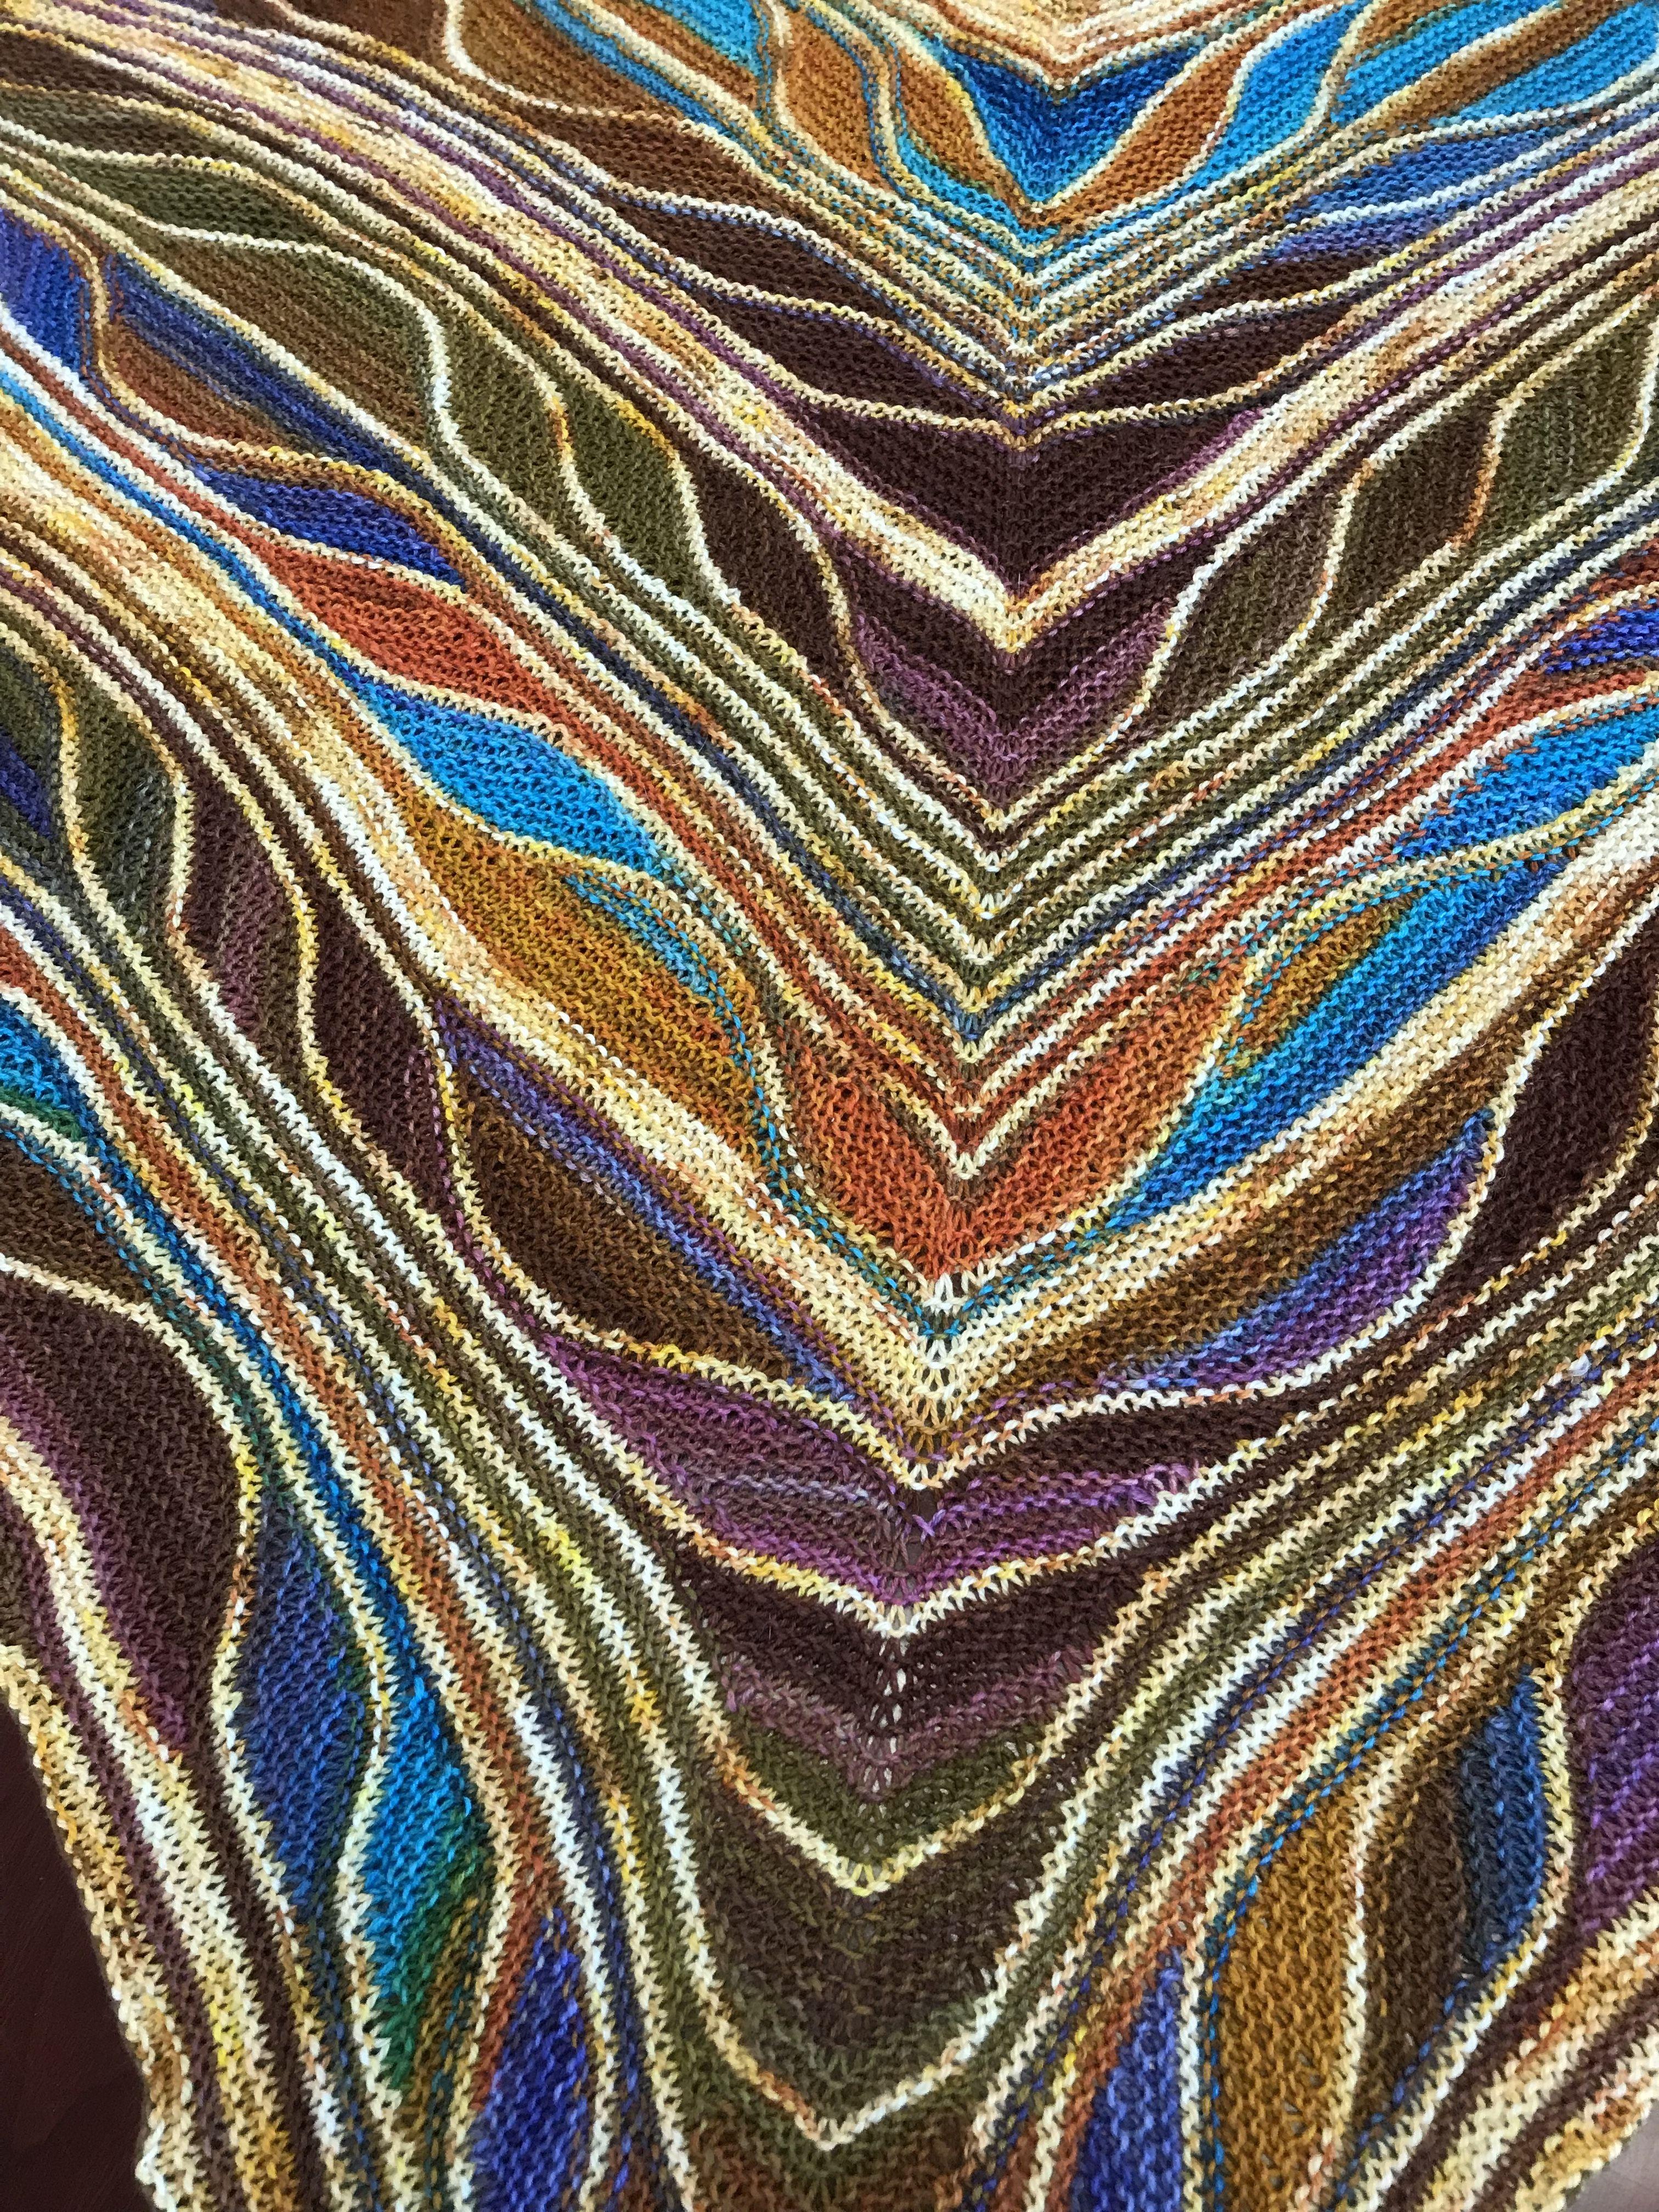 Uneek Butterfly Shawl Knitting Knitted Shawls Shawl Bohemian Rug